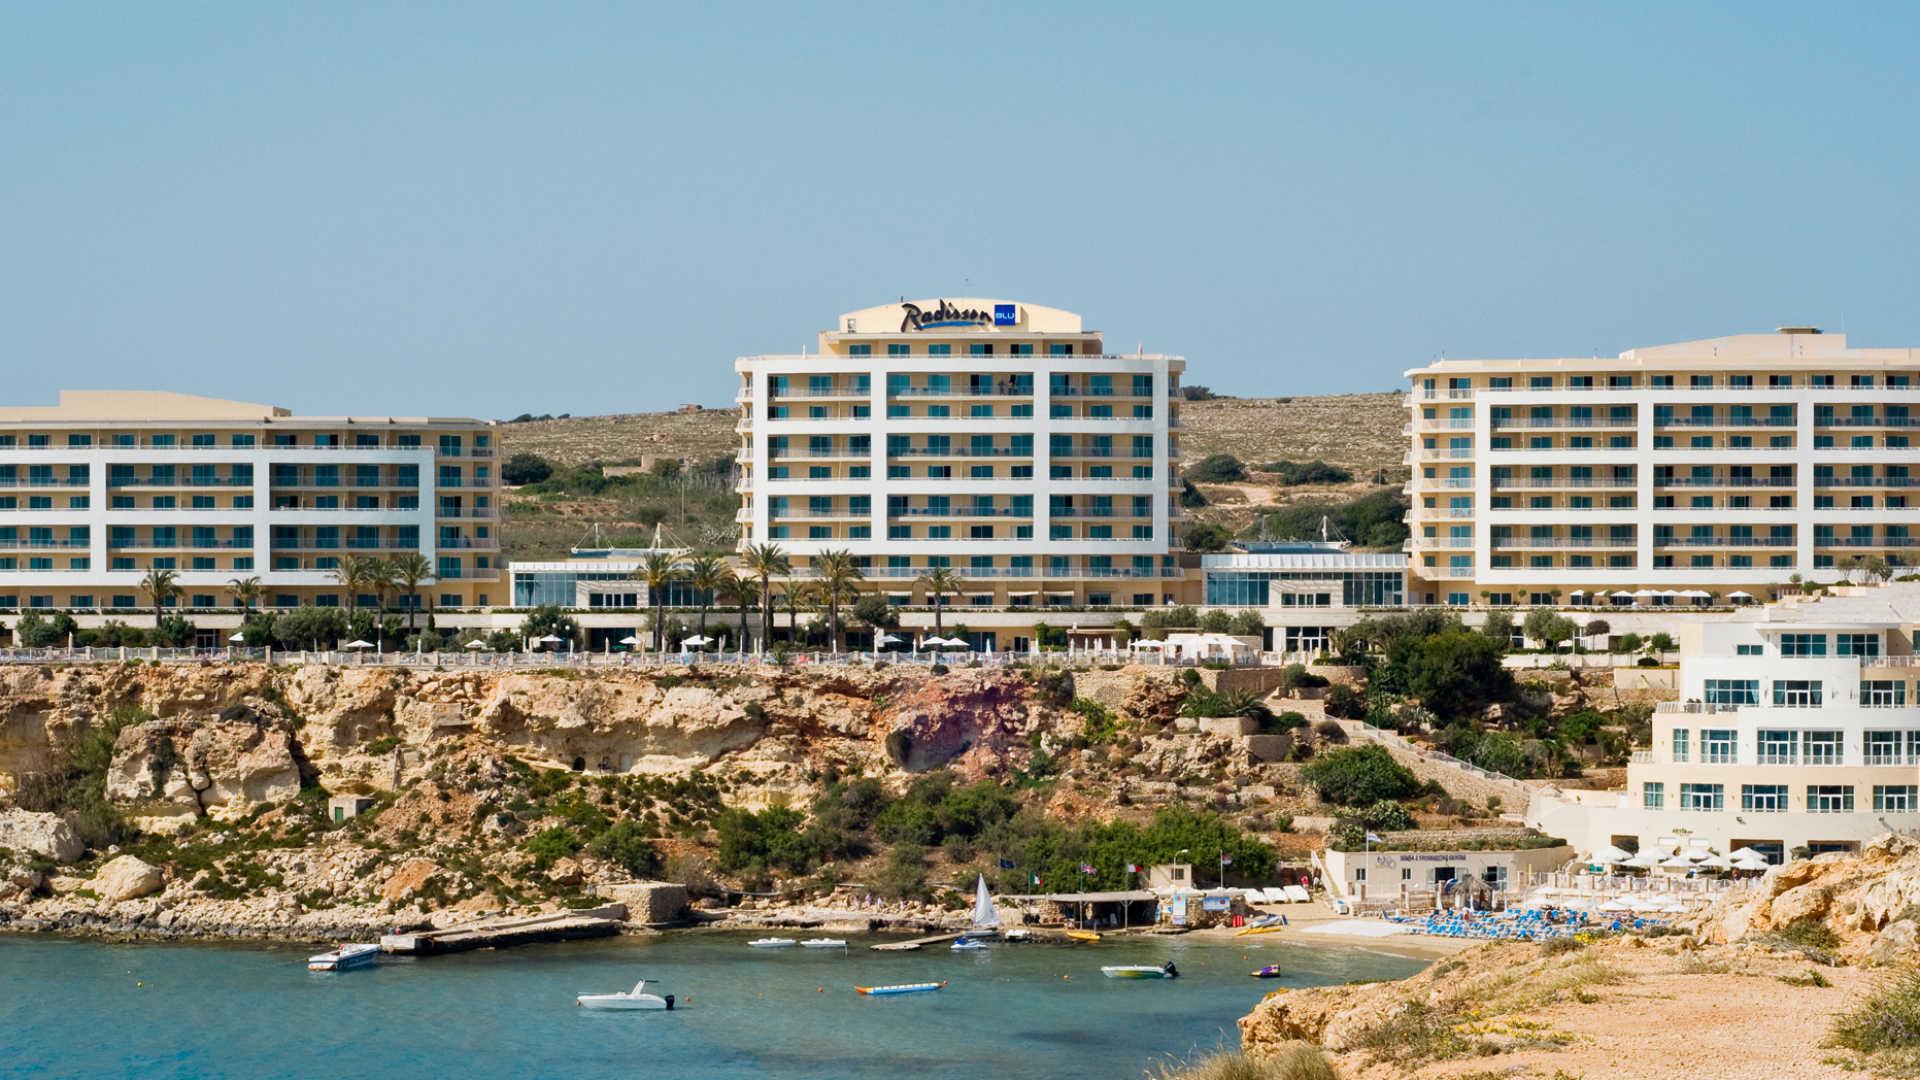 radisson-blu-resort-and-spa-malta-golden-sands